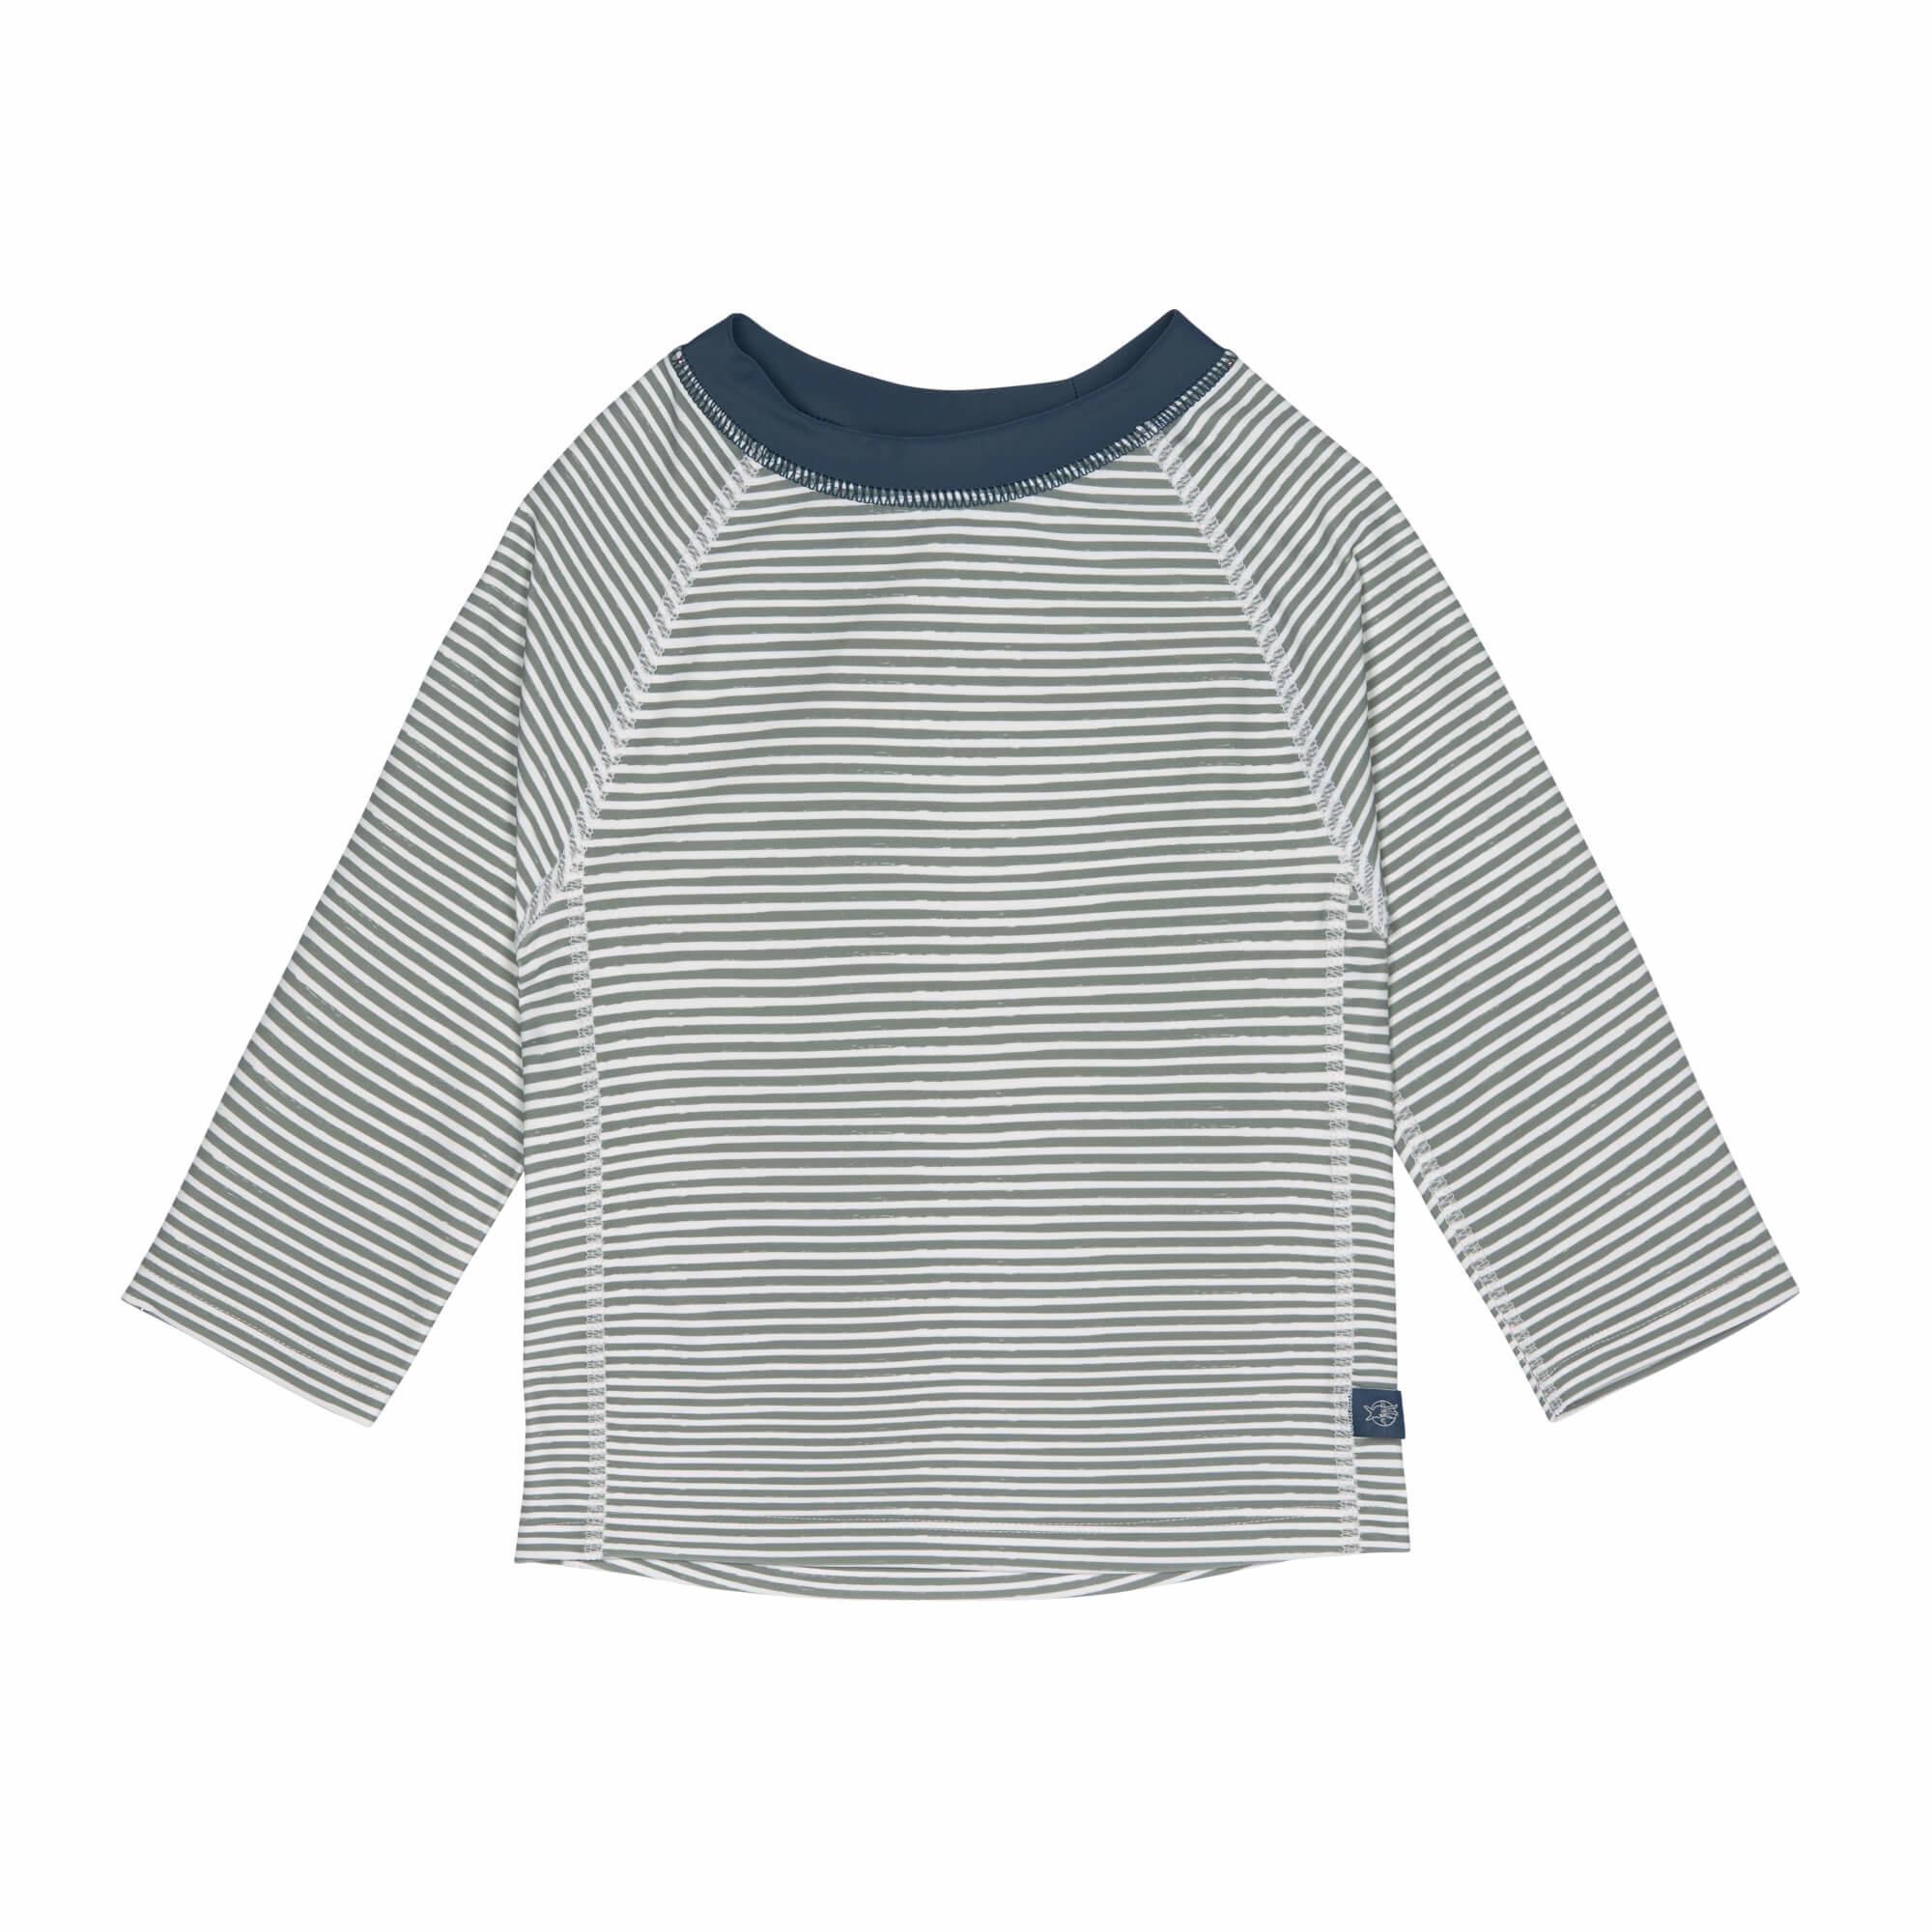 Lässig Splash & Fun Lange mouw Rashguard / zwemshirt Striped blue